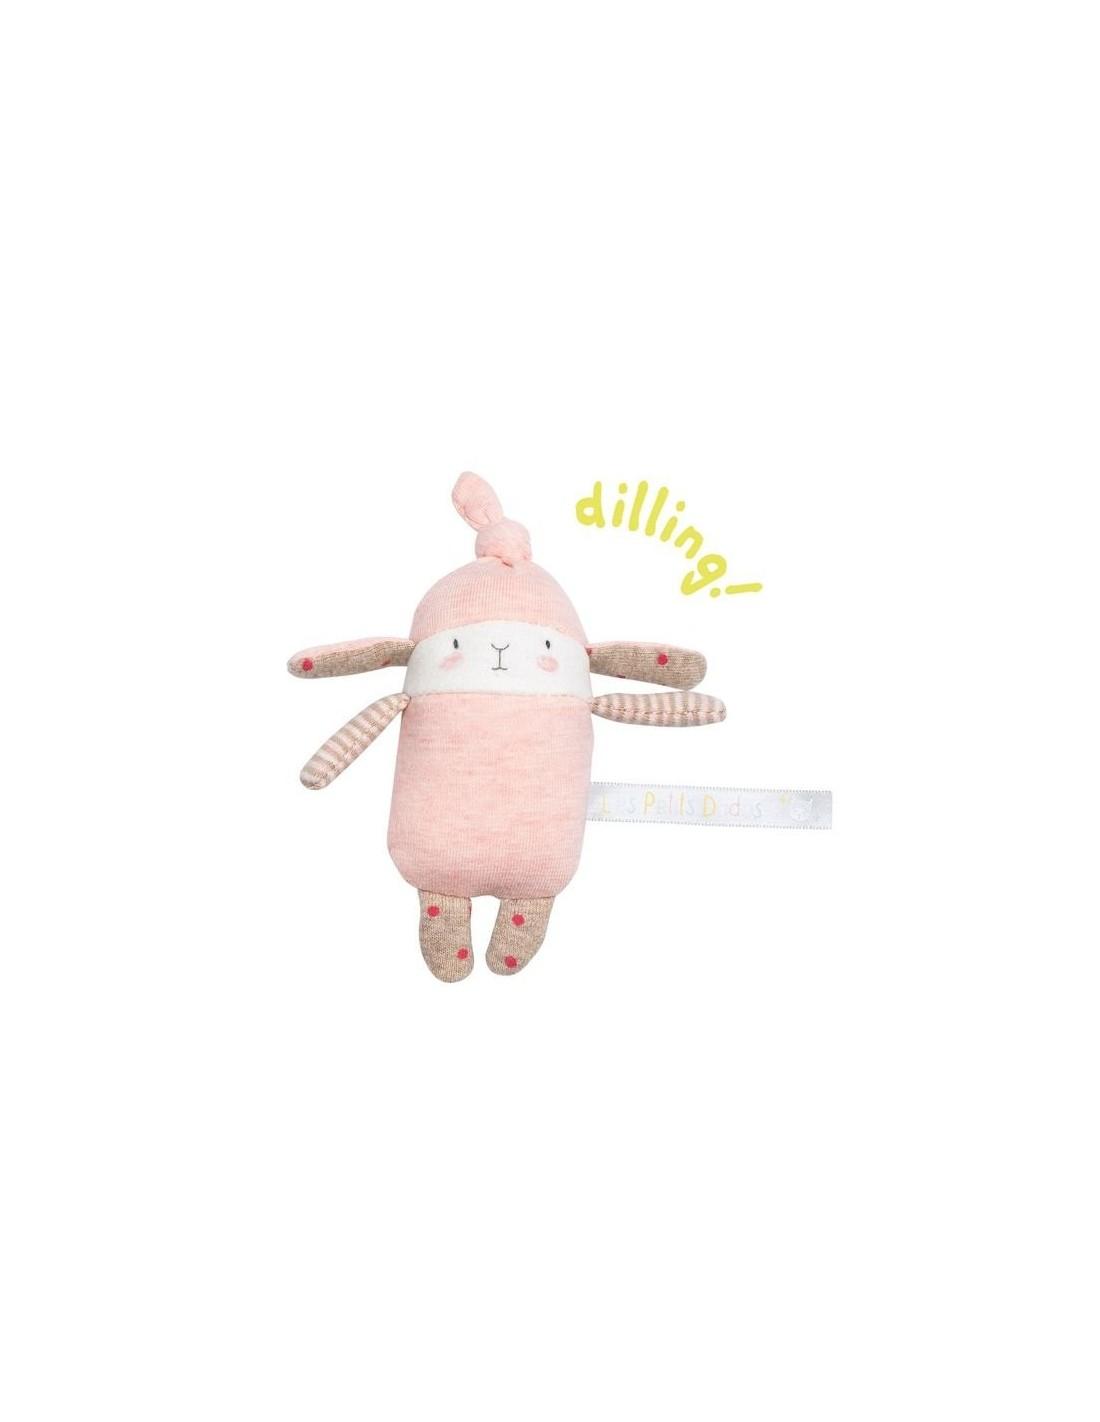 Hochet Petit Lapin Rose Lulu Les Petits Dodos - Moulin Roty dedans Lapin Lulu